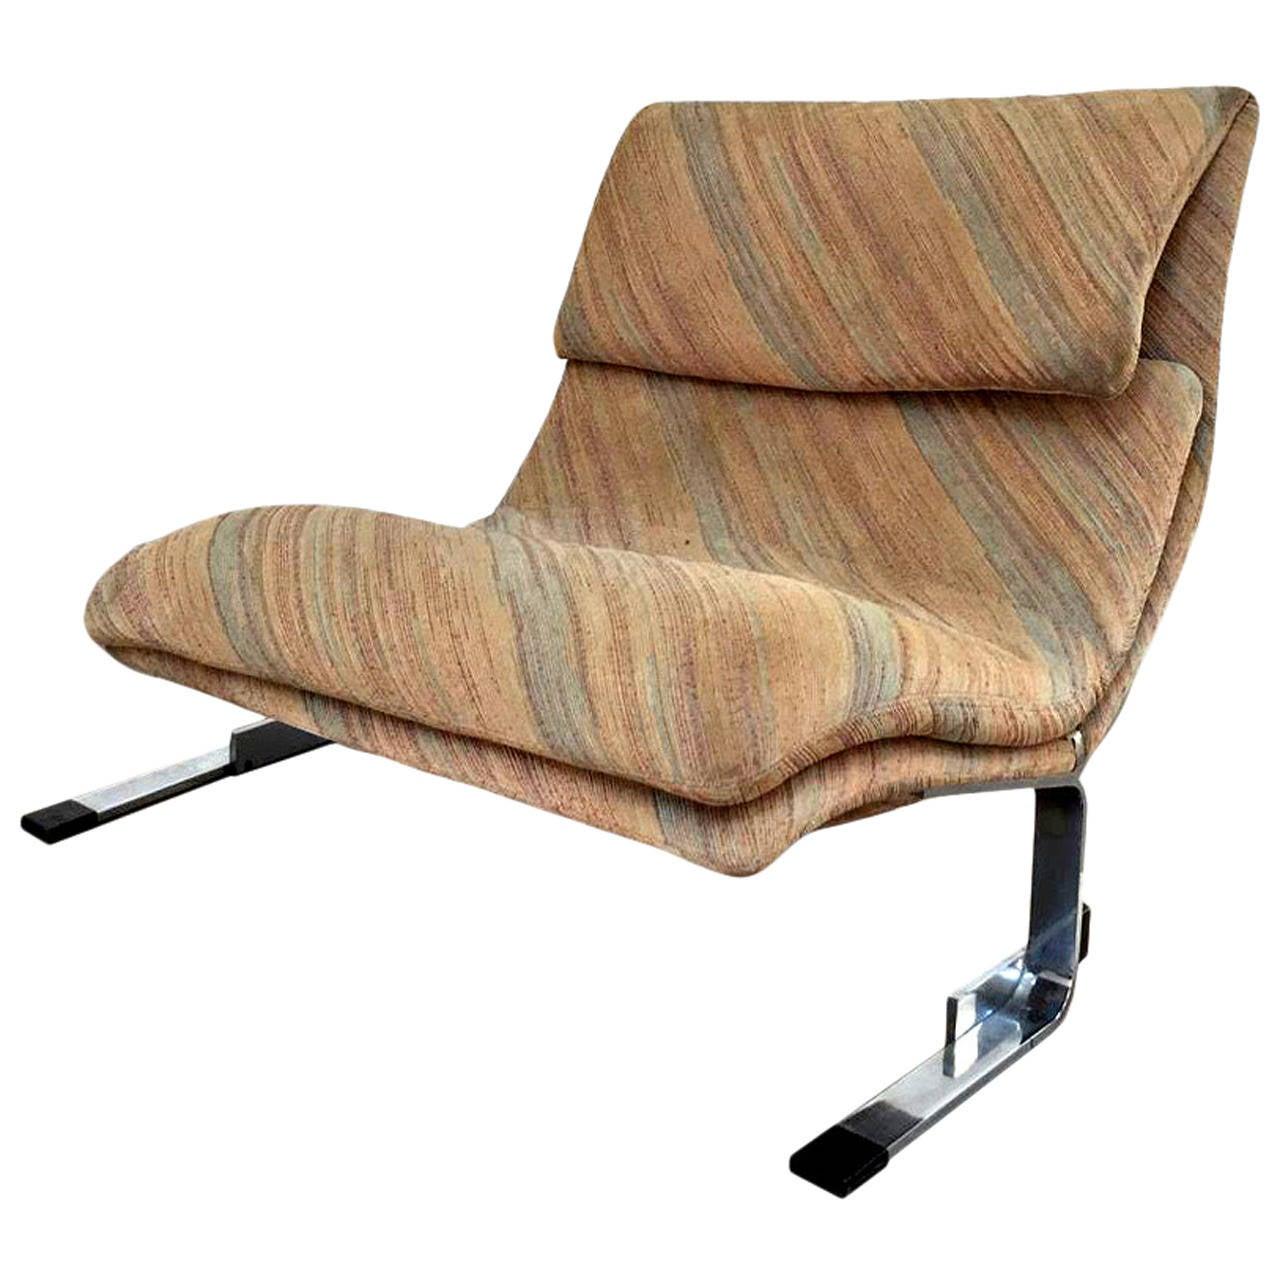 "Onda Chair And Ottoman In Missoni Fabric By Giovanni: Three ""Onda (Wave) Lounge Chairs"",Design Saporiti At 1stdibs"